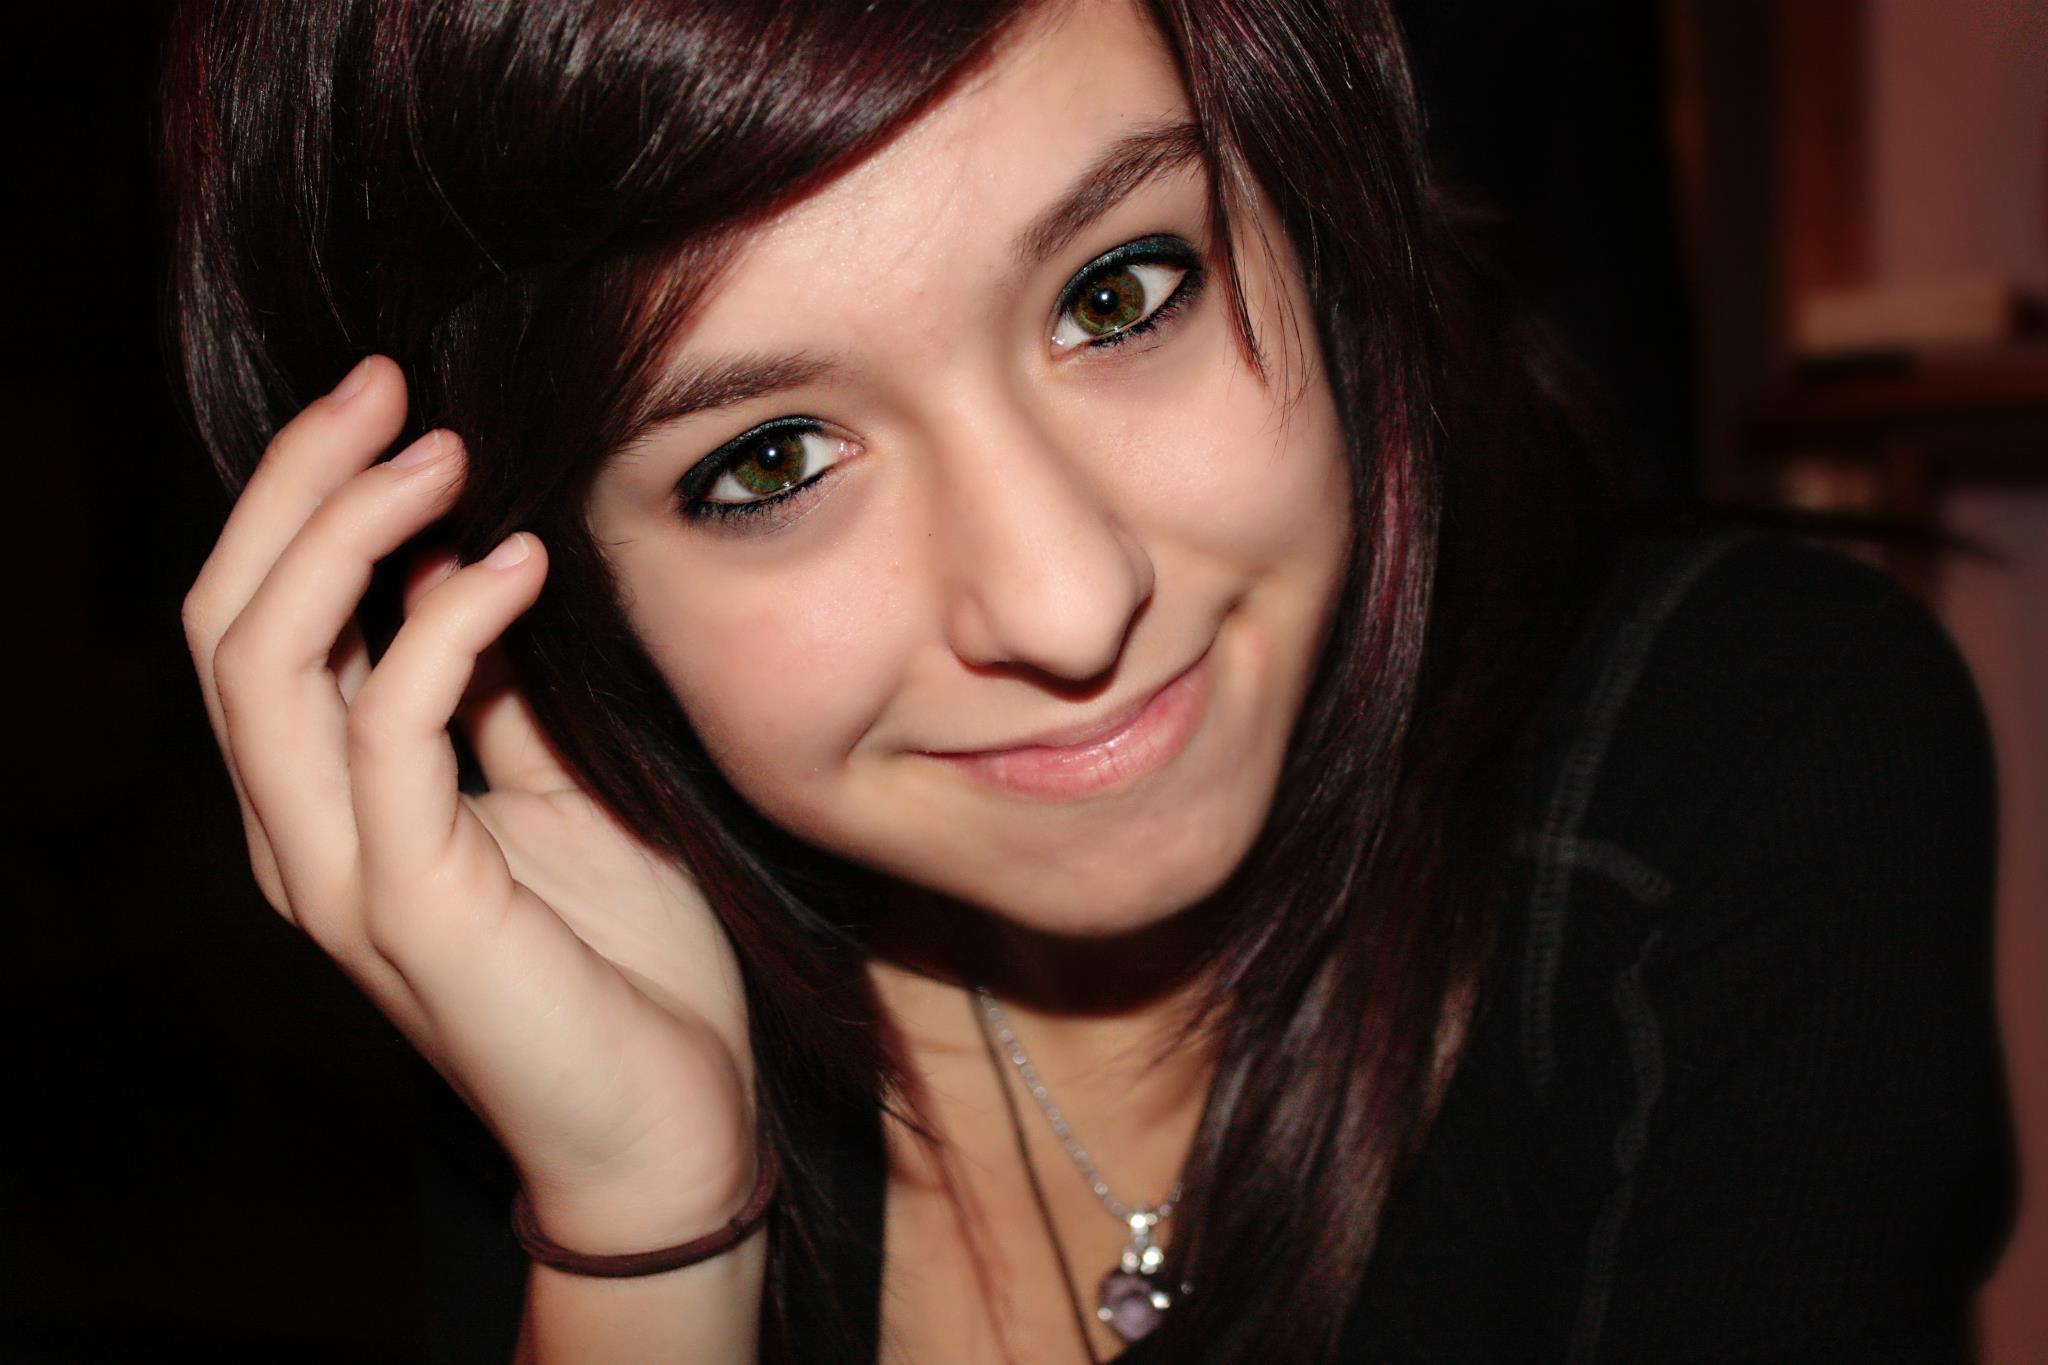 Christina Grimmie Hair The Voice